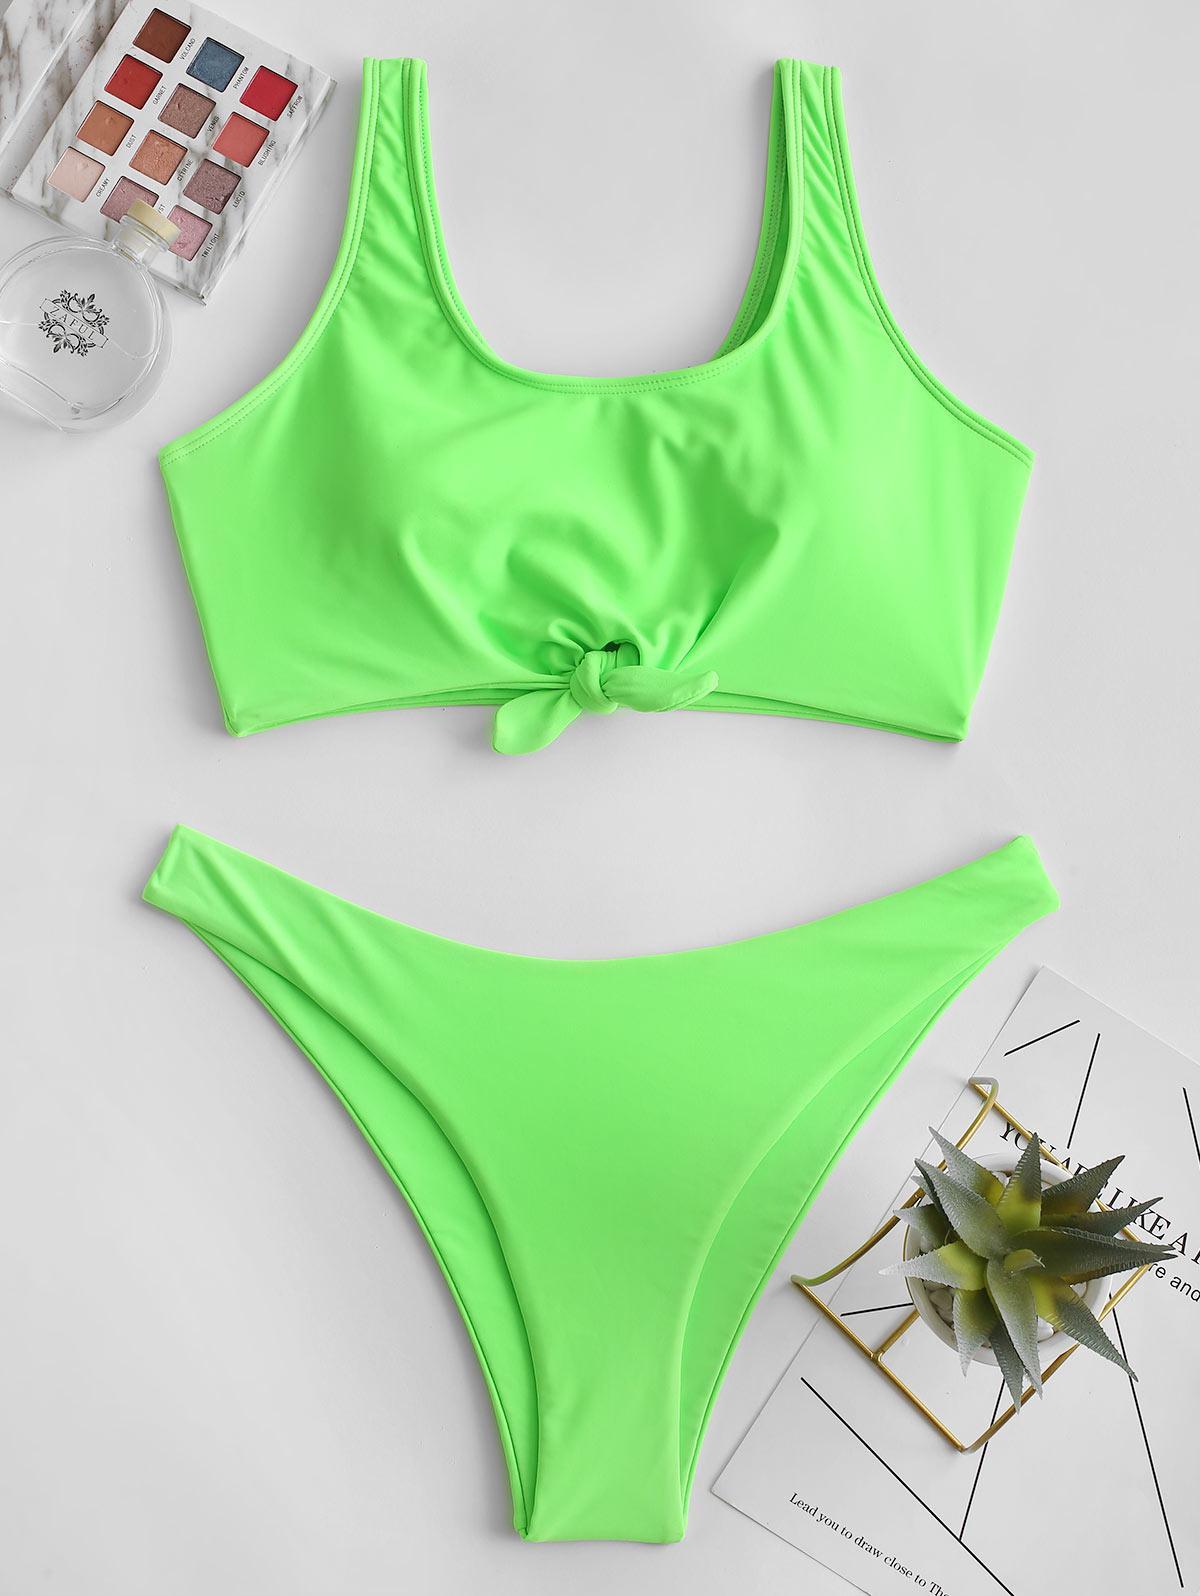 ZAFUL Knot High Cut Sports Bikini Swimsuit фото